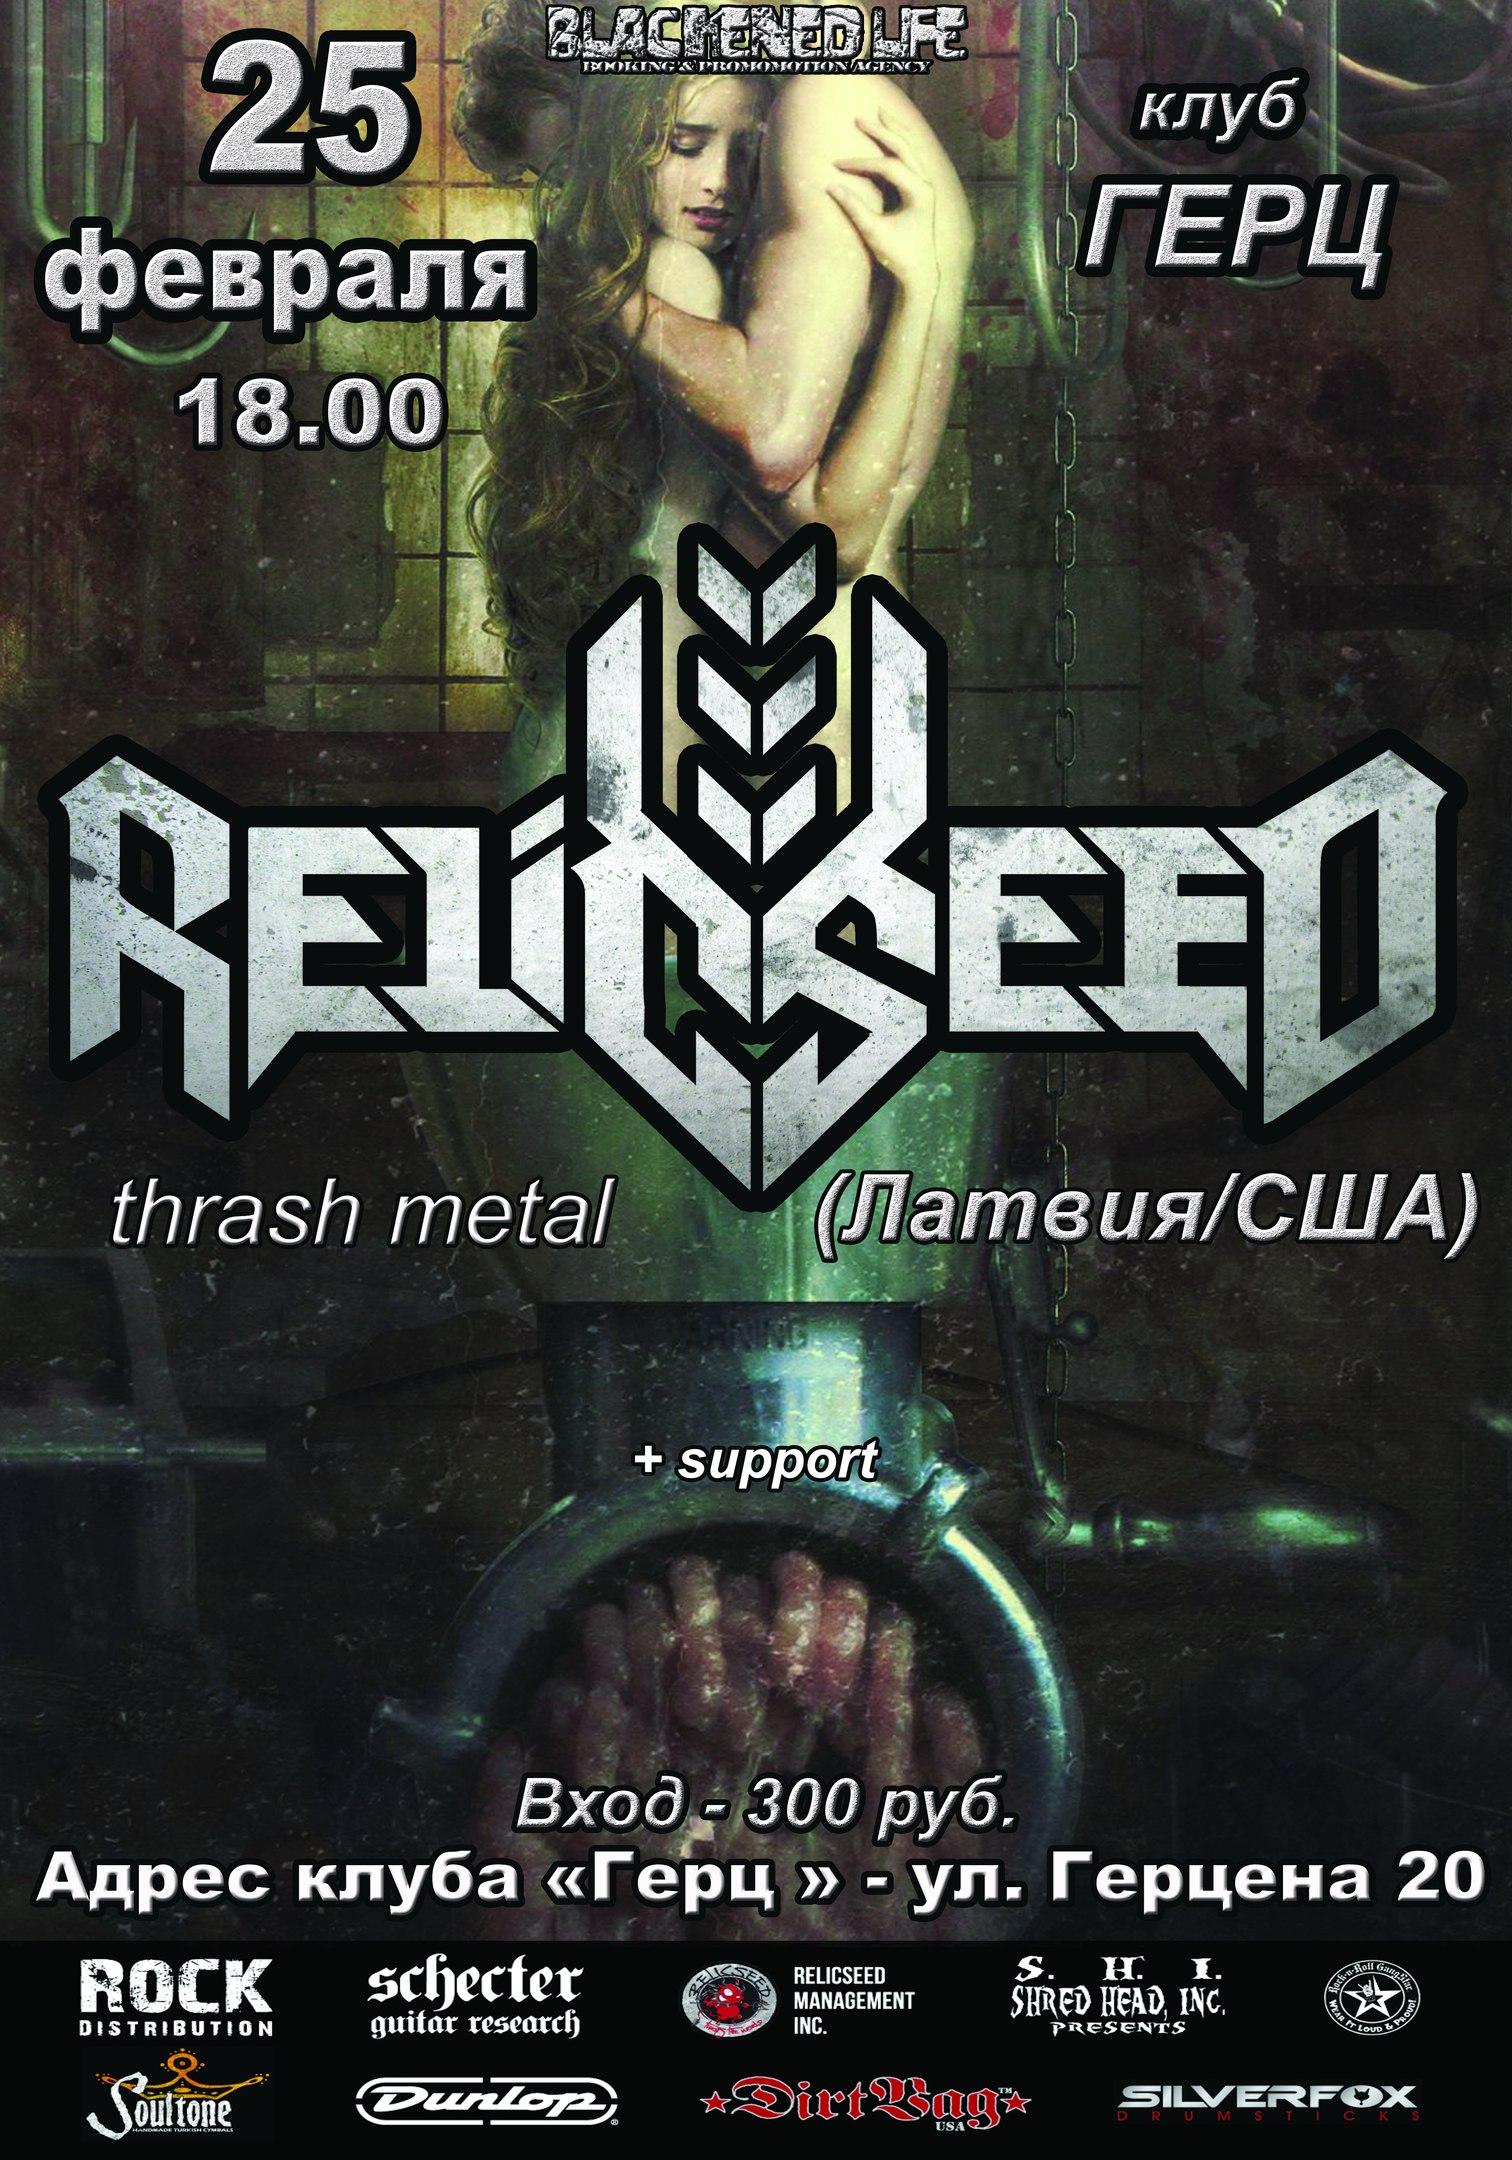 Relicseed